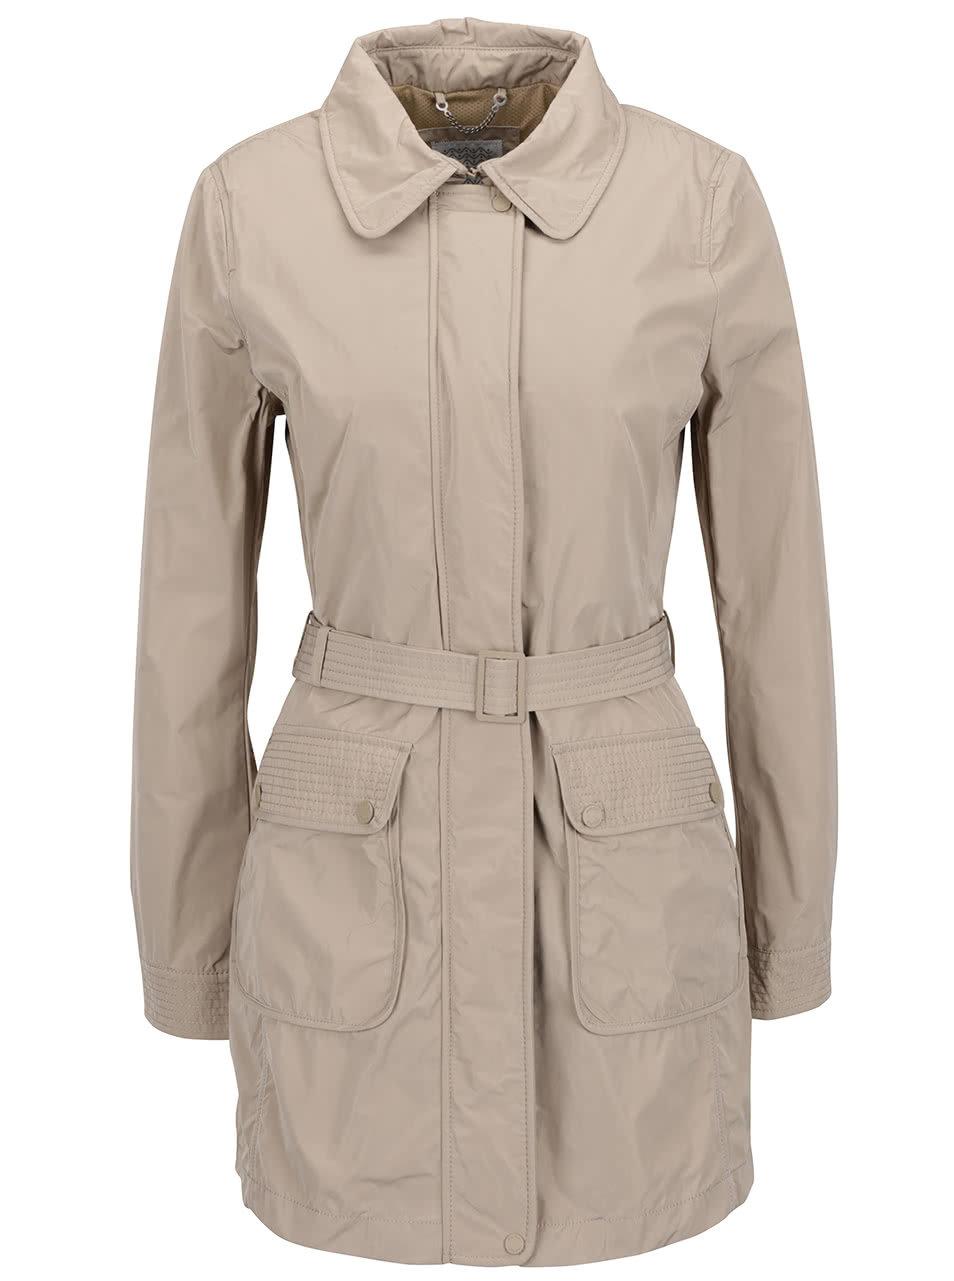 Béžový dámský kabát s páskem Geox ... a7a7179485